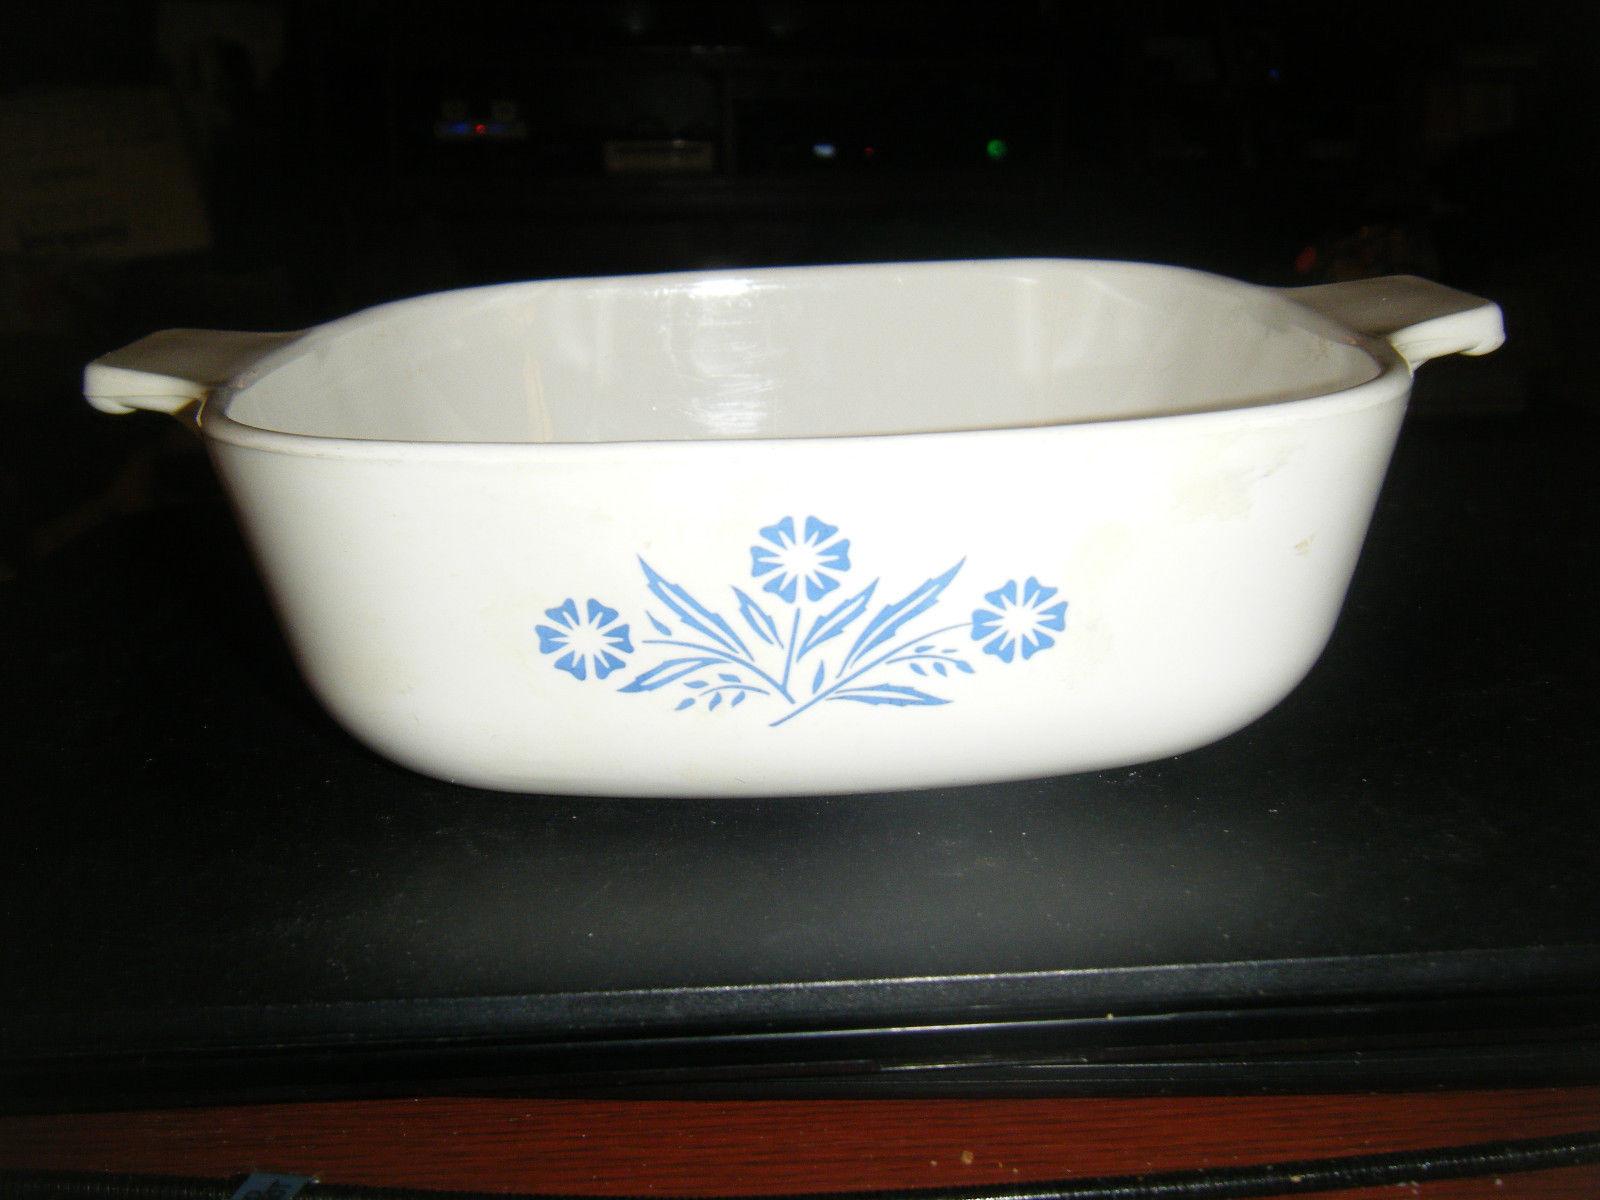 Vintage Corning Ware 1 Qt. Cornflower Design Baking Dish #P-1-B